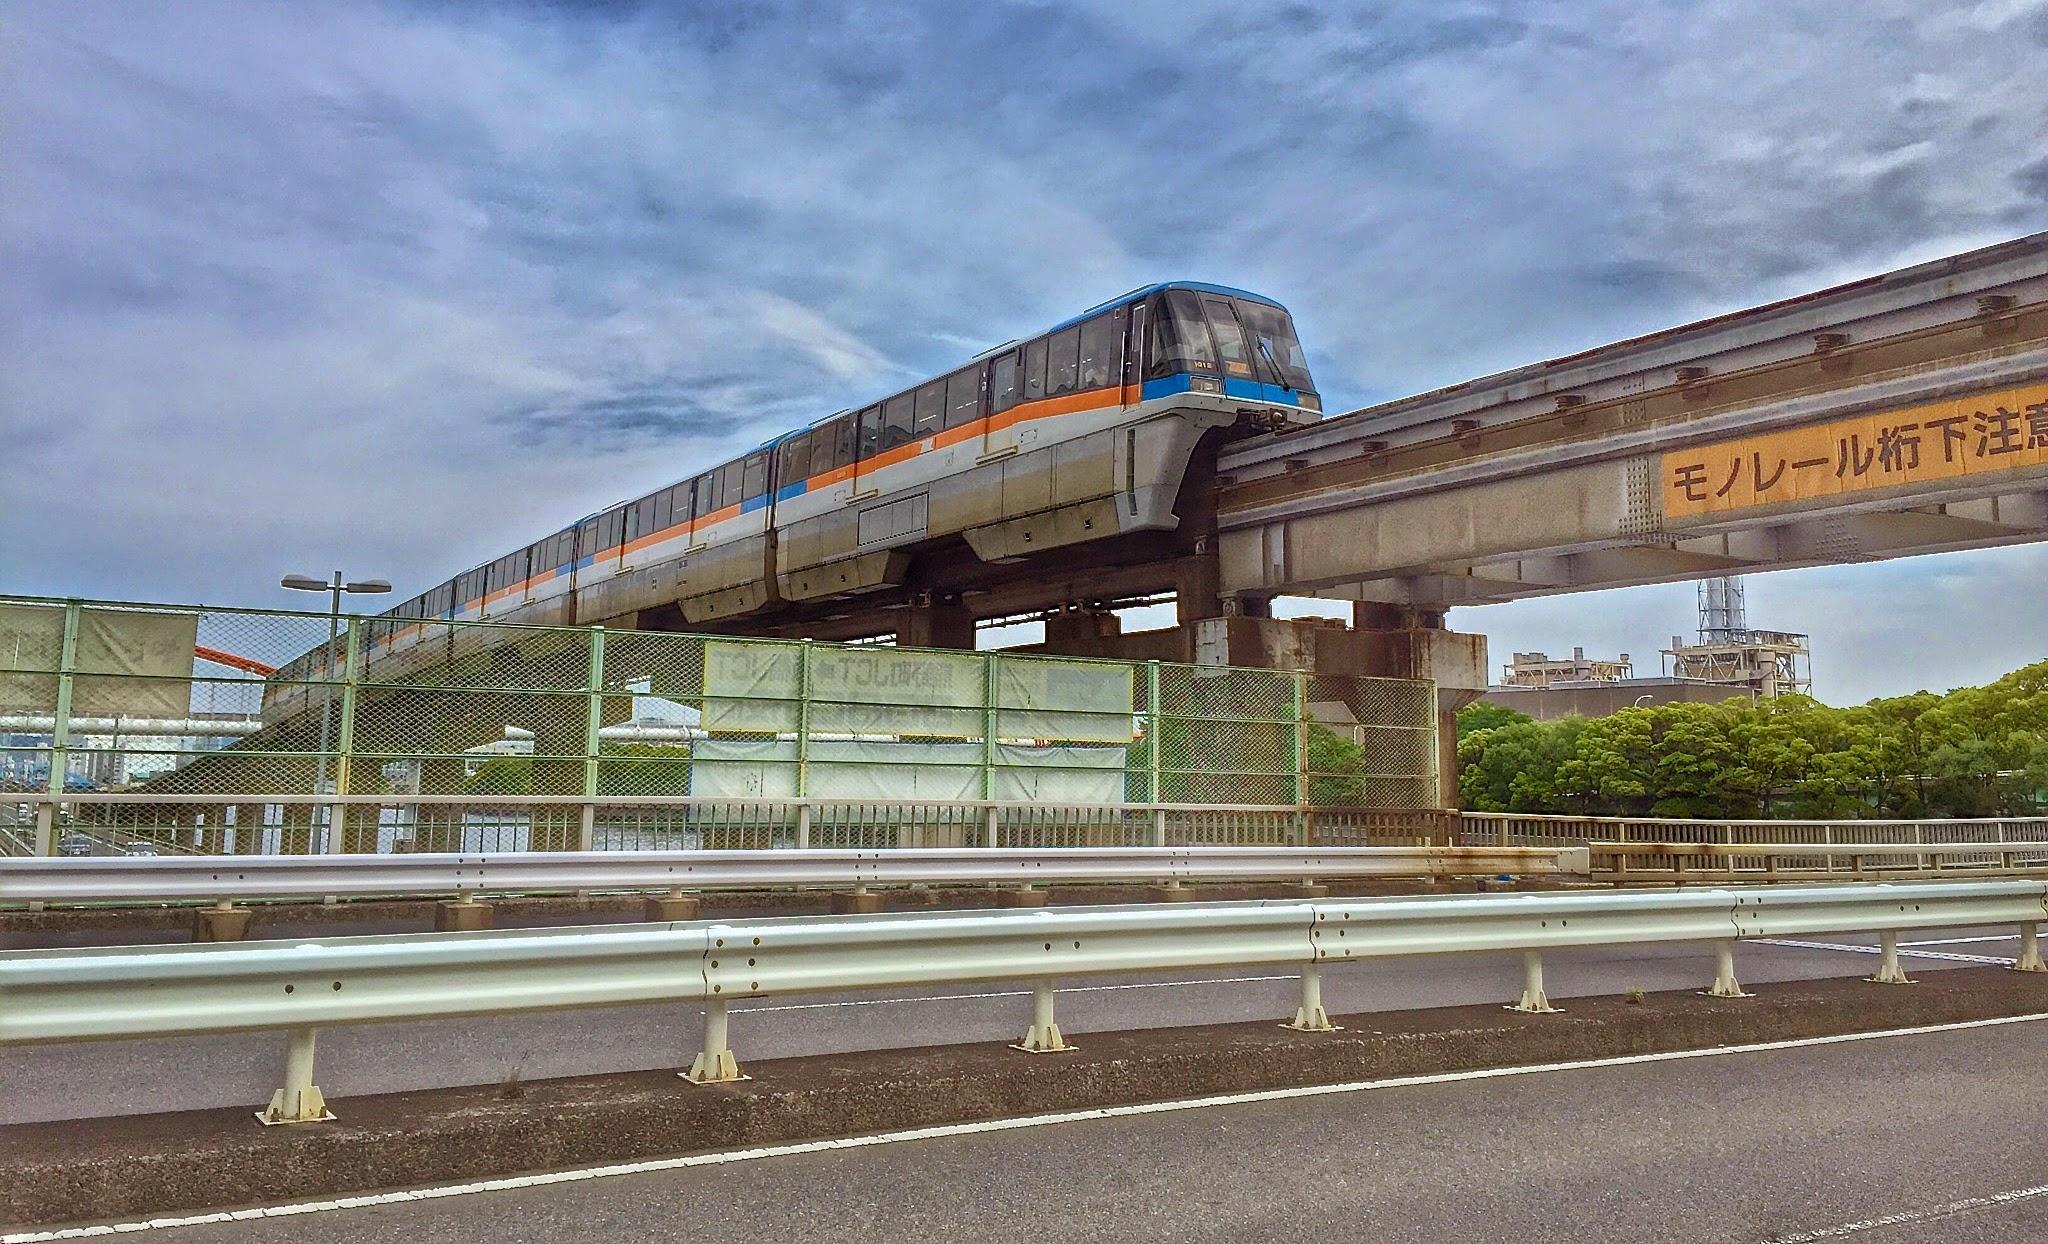 Tokyo Subway Map Keikyu Asakusa Mita.Cheapest Transport From Haneda Airport To Tokyo Tokyo Cheapo